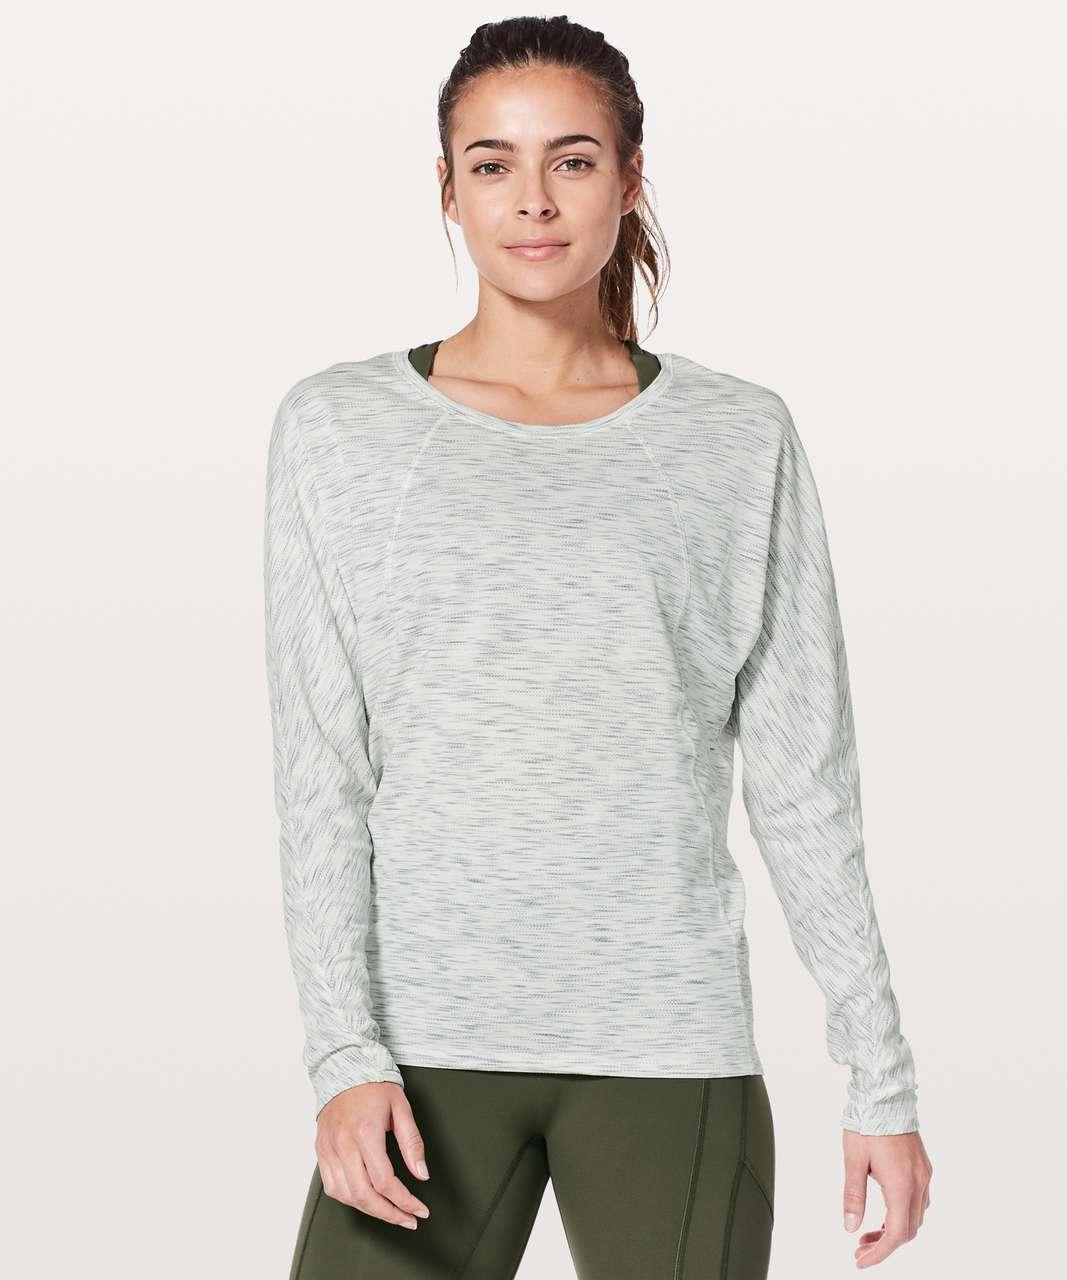 Lululemon Set To Sweat Long Sleeve - Tiger Space Dye Hail White